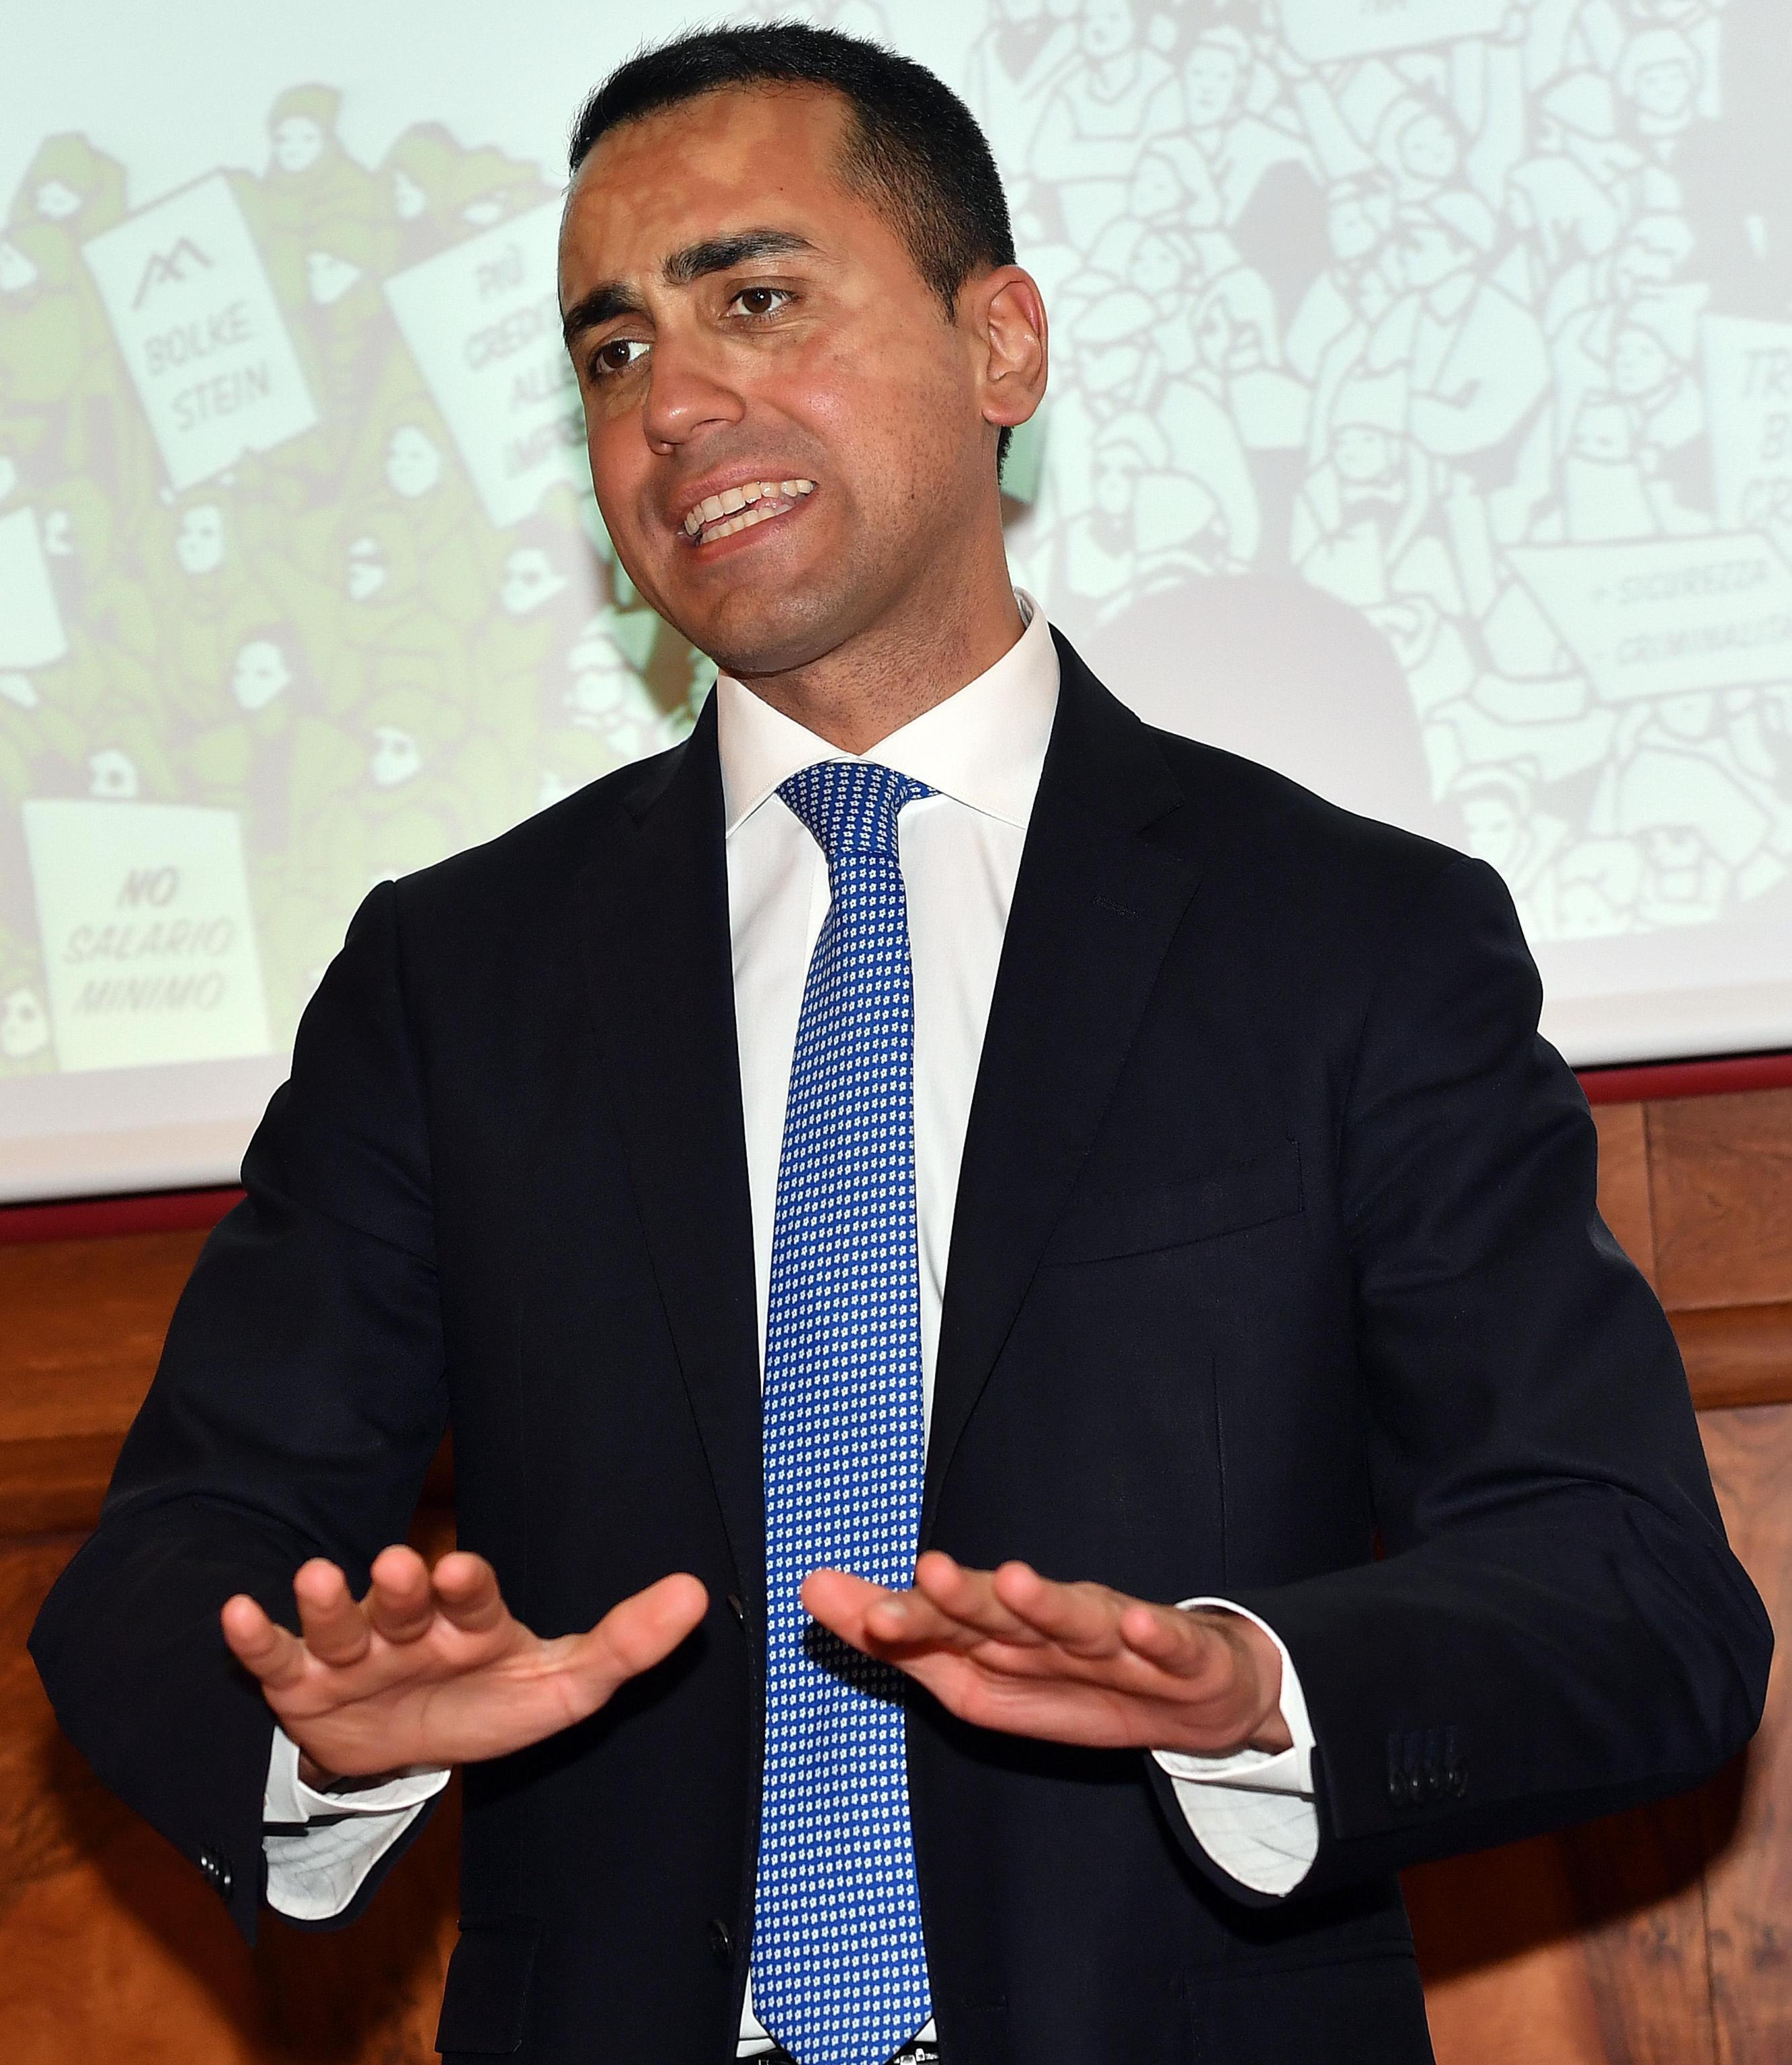 Elezioni 2018, Torrigiani (Pd):